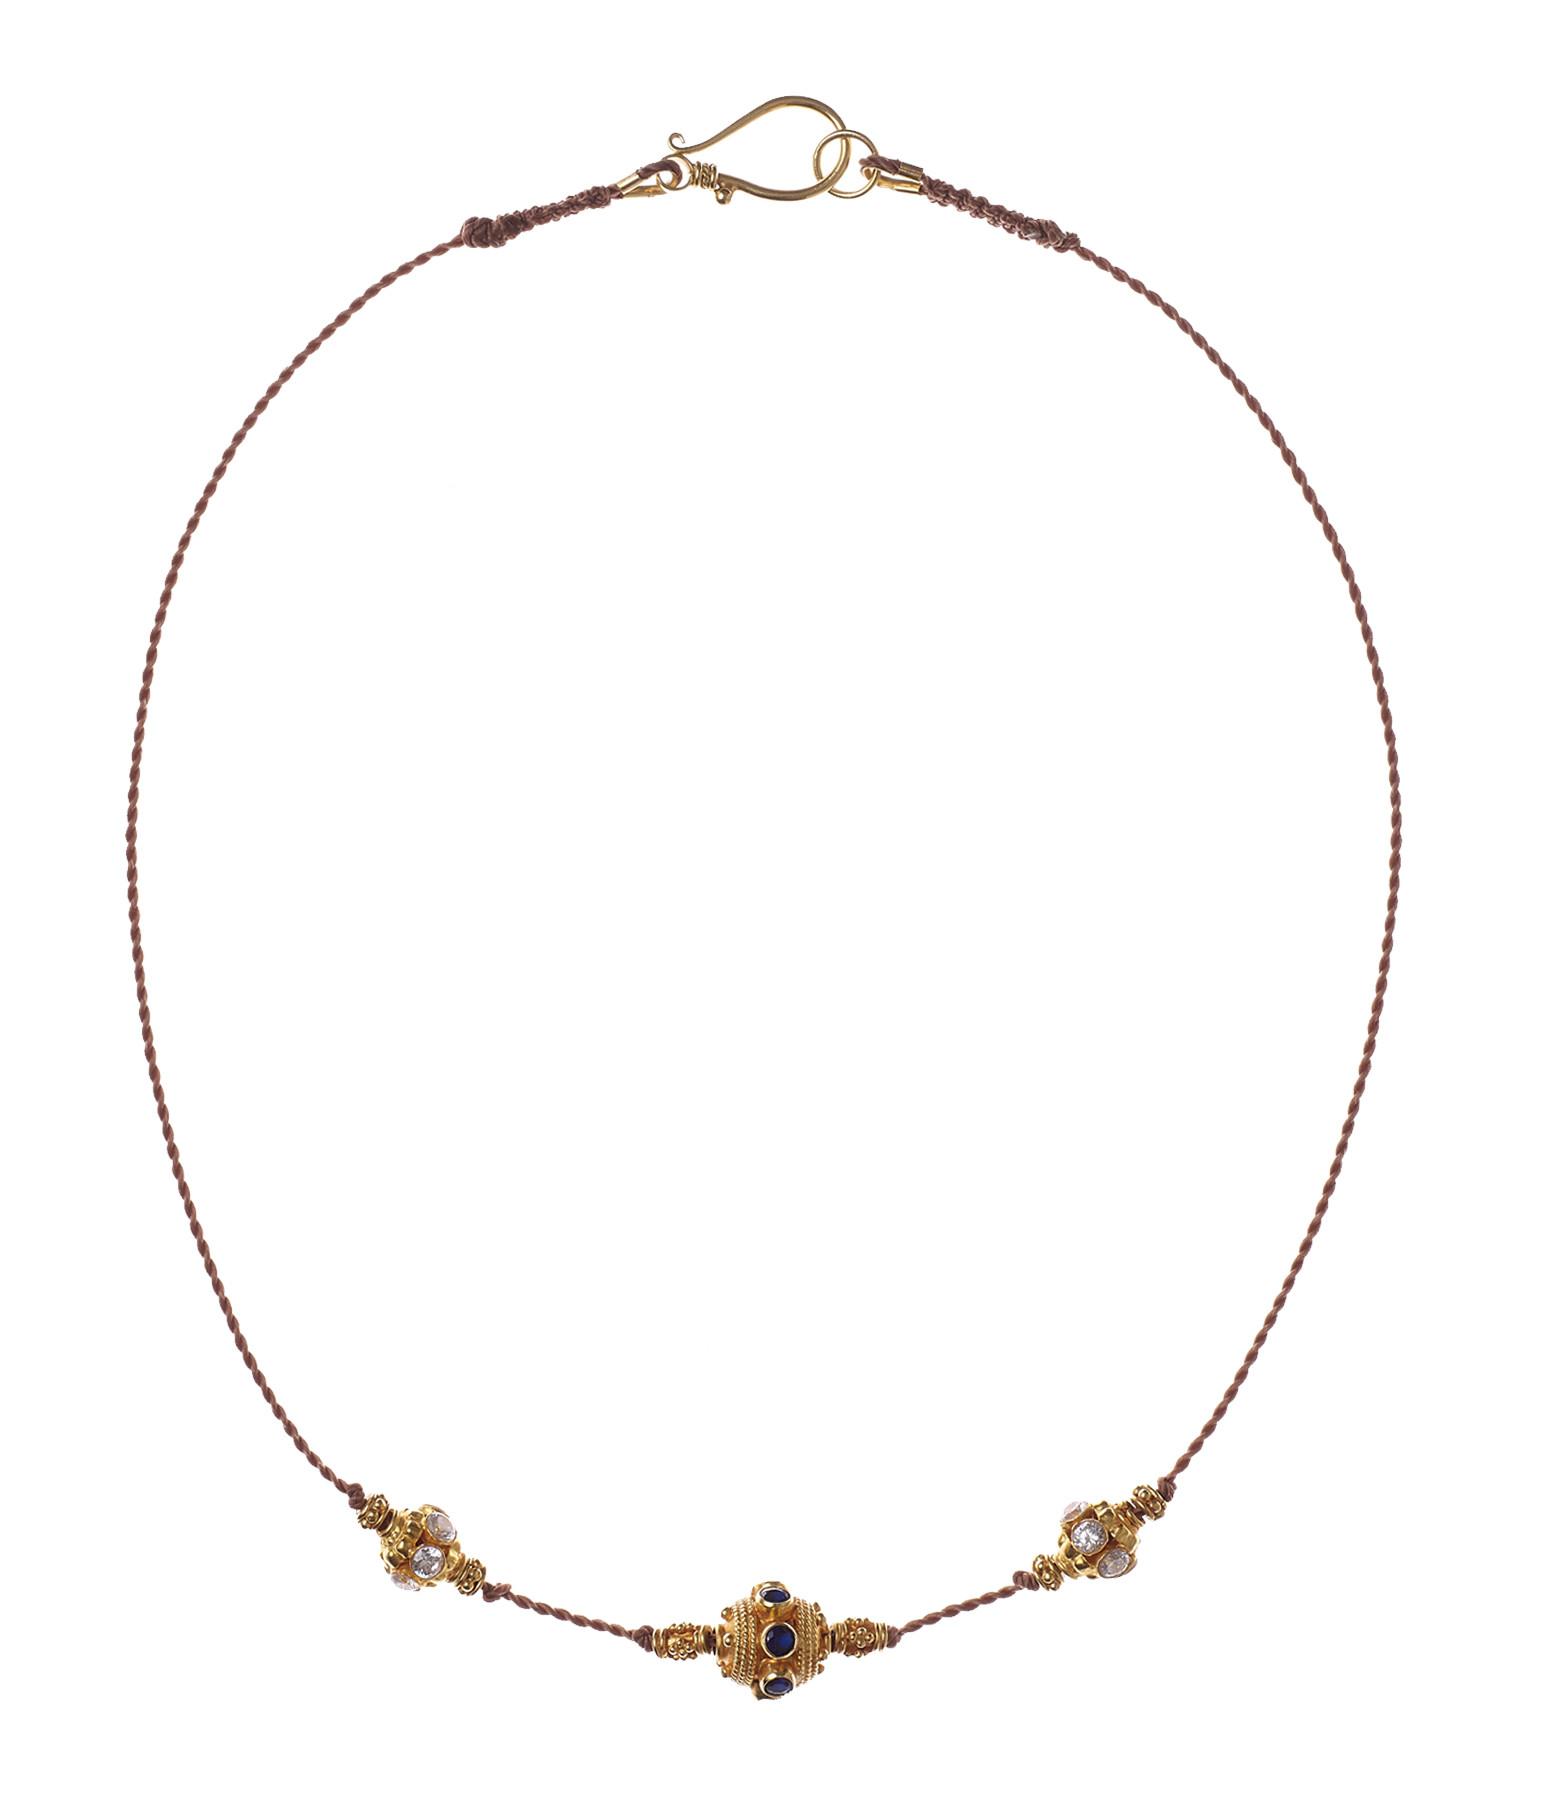 TITYARAVY - Collier Mahadevi Diamants Saphirs Or